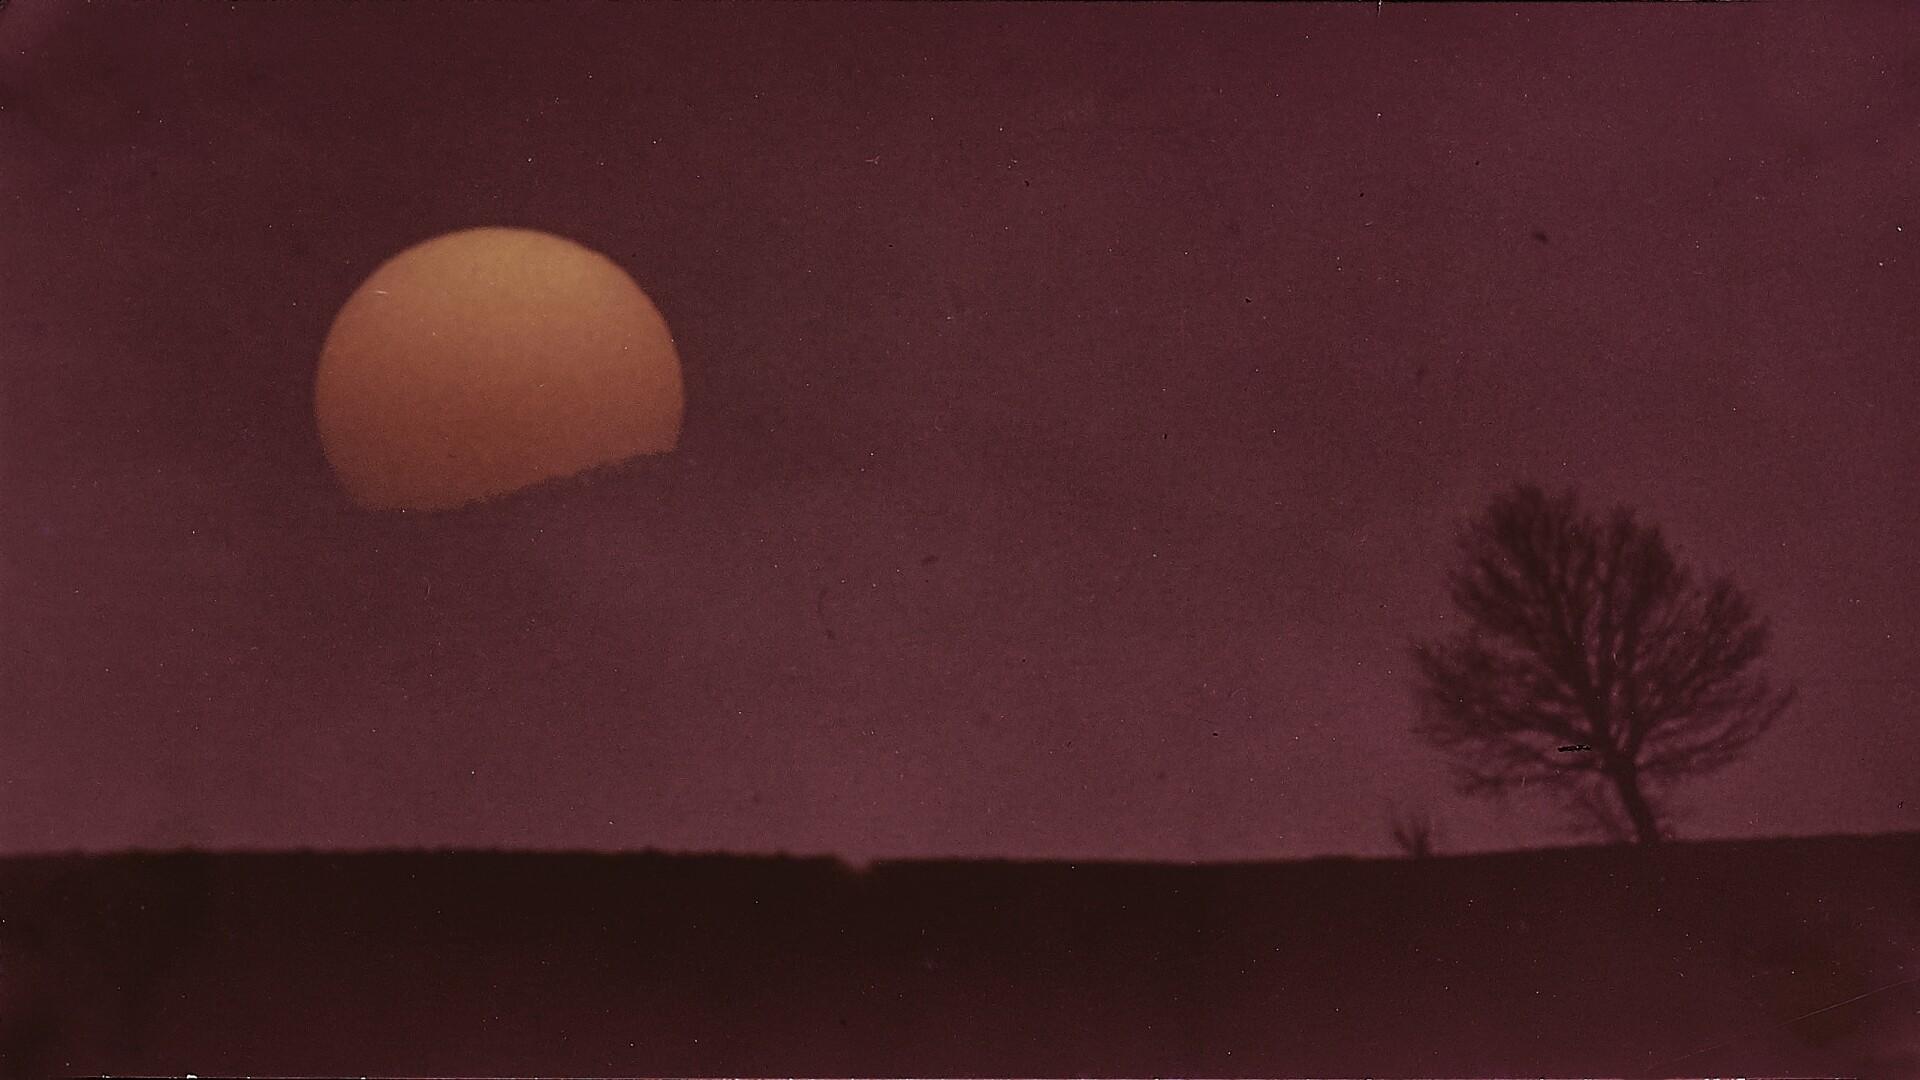 Ночь, 1973. Фотограф Франко Фонтана